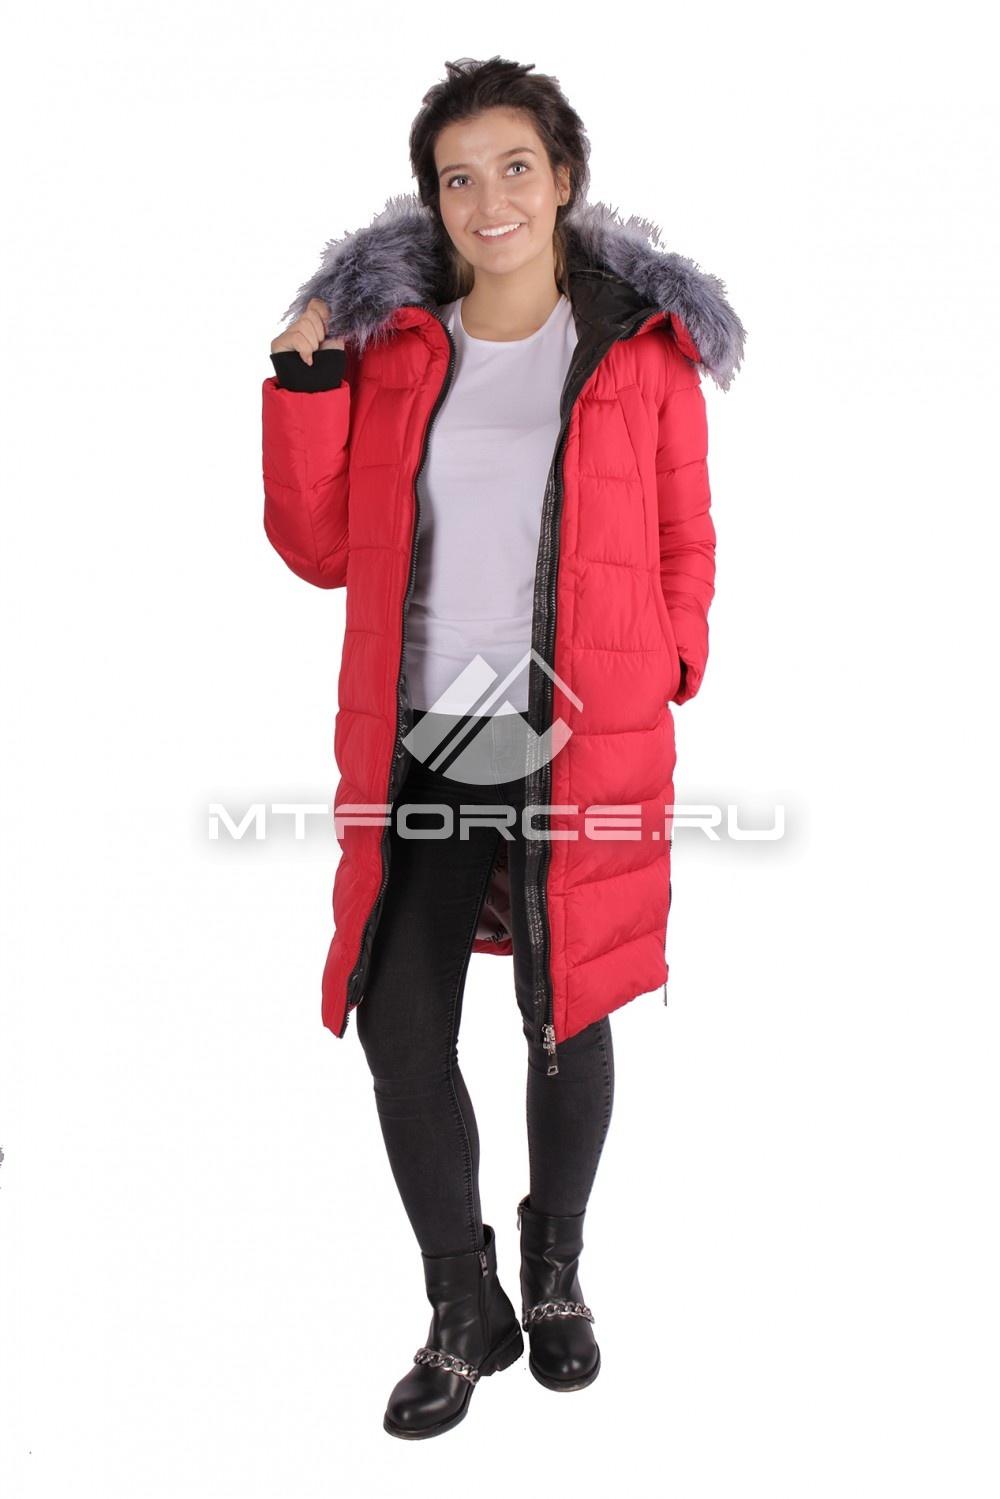 Купить                                  оптом Пуховик ТРЕНД женский зимний красного цвета 16053Kr в Санкт-Петербурге